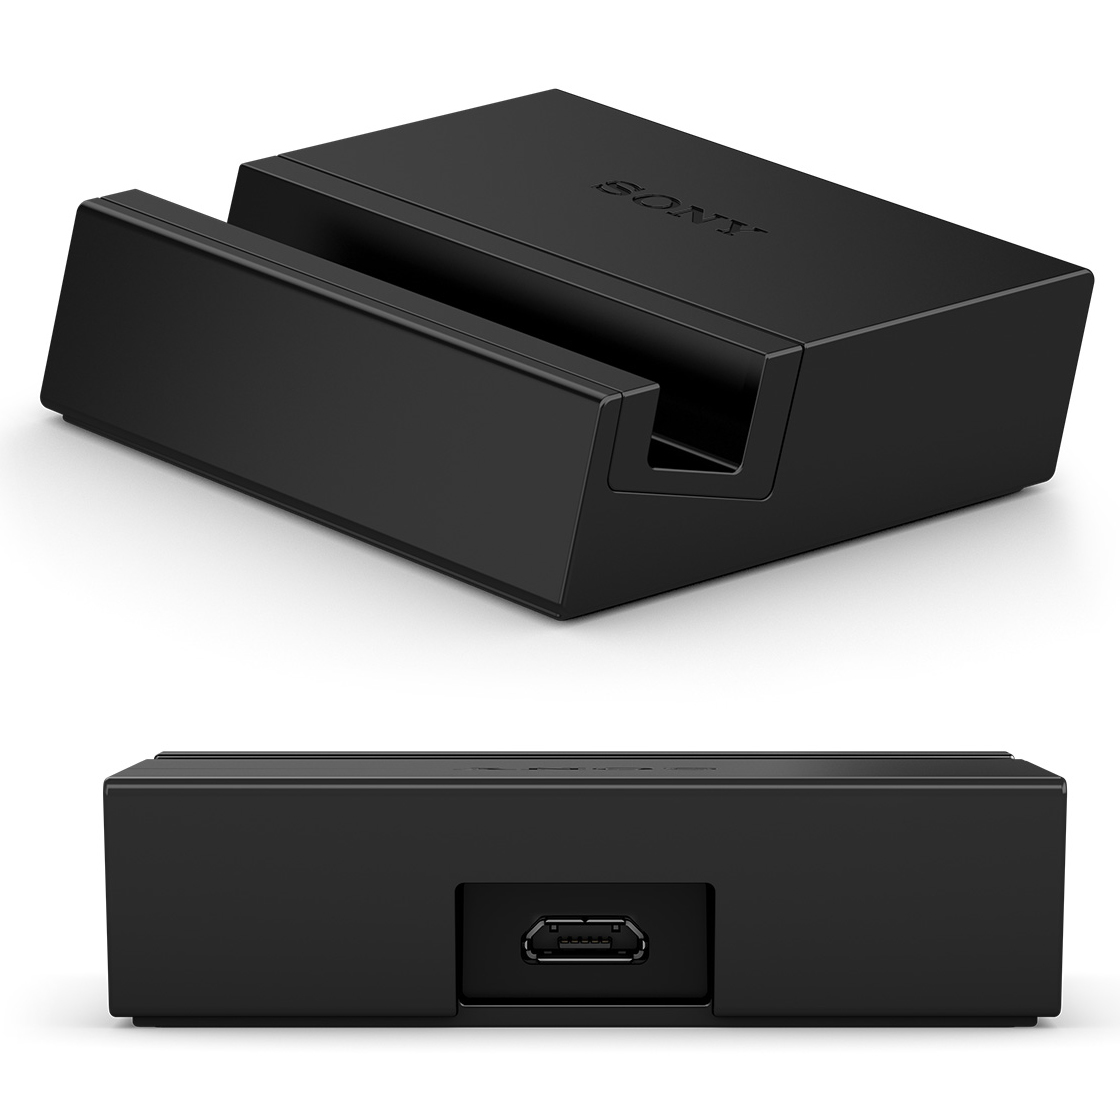 SONY Xpreia Z3 / Z3 compact 磁性充電座 原廠座充( DK48 ) 【葳豐數位商城】